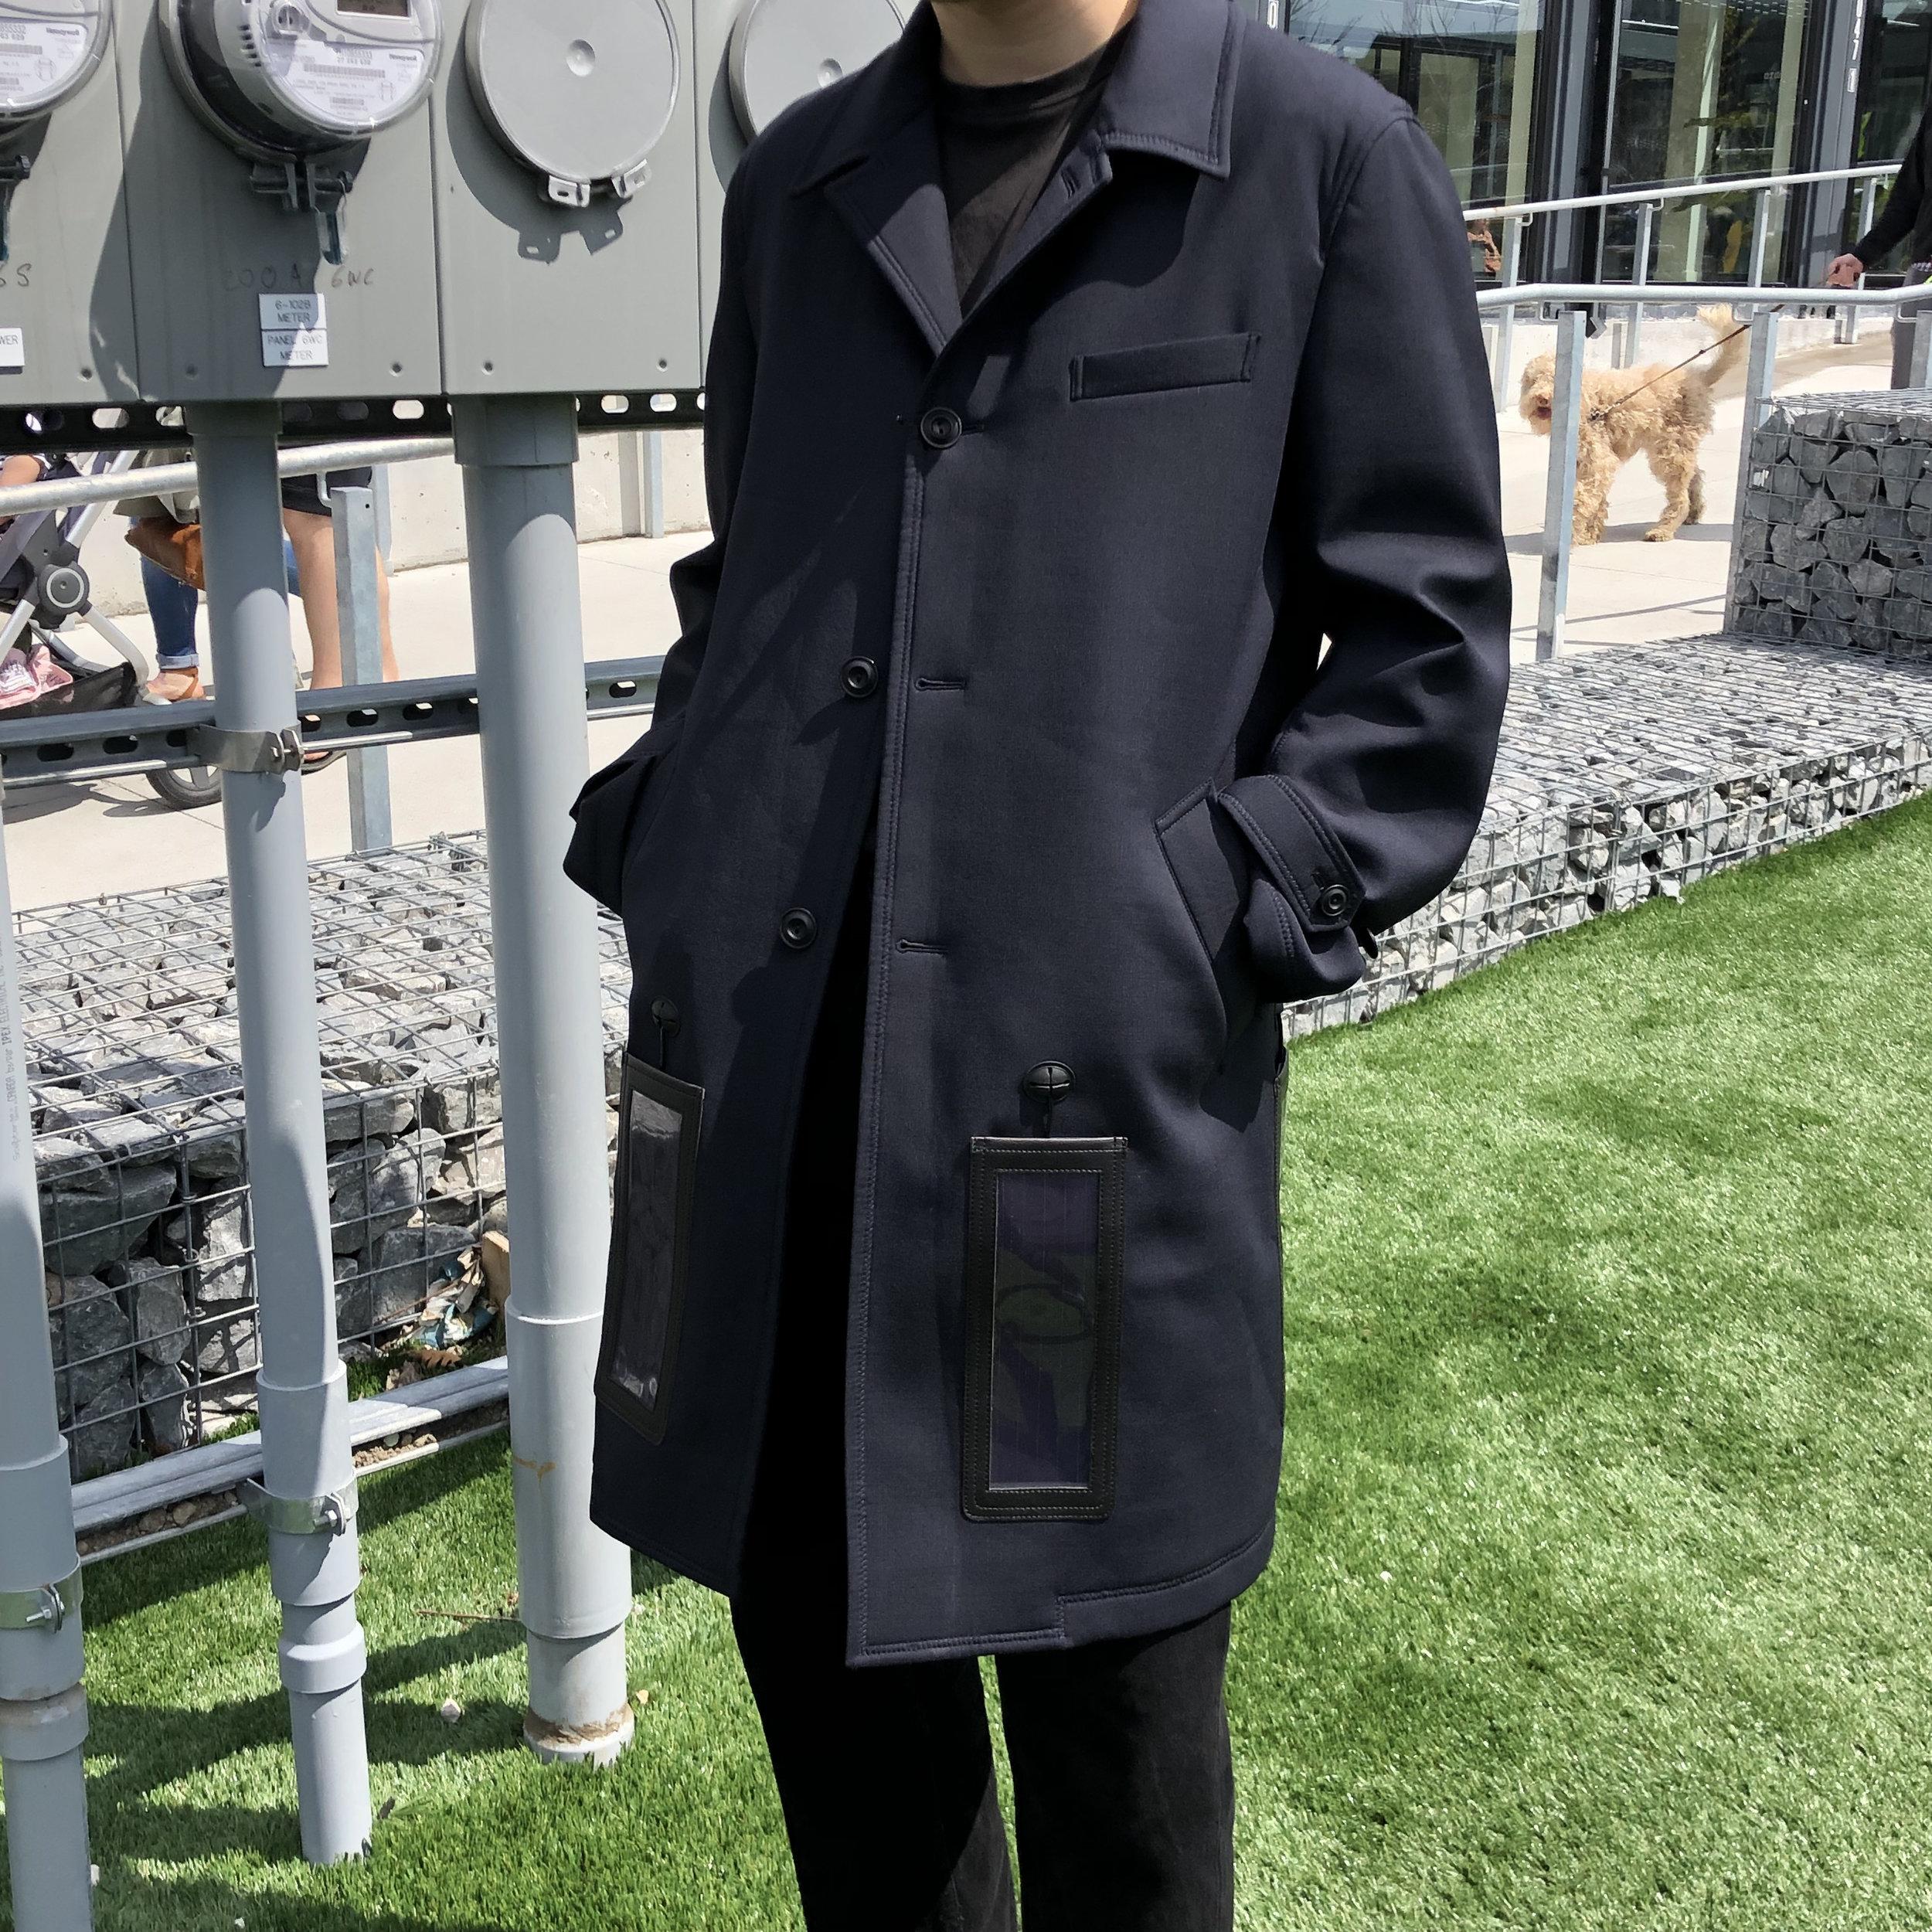 FEATURED: Junya Watanabe COMME des GARÇONS MAN Solar Panelled Neoprene Coat with External Battery Charger